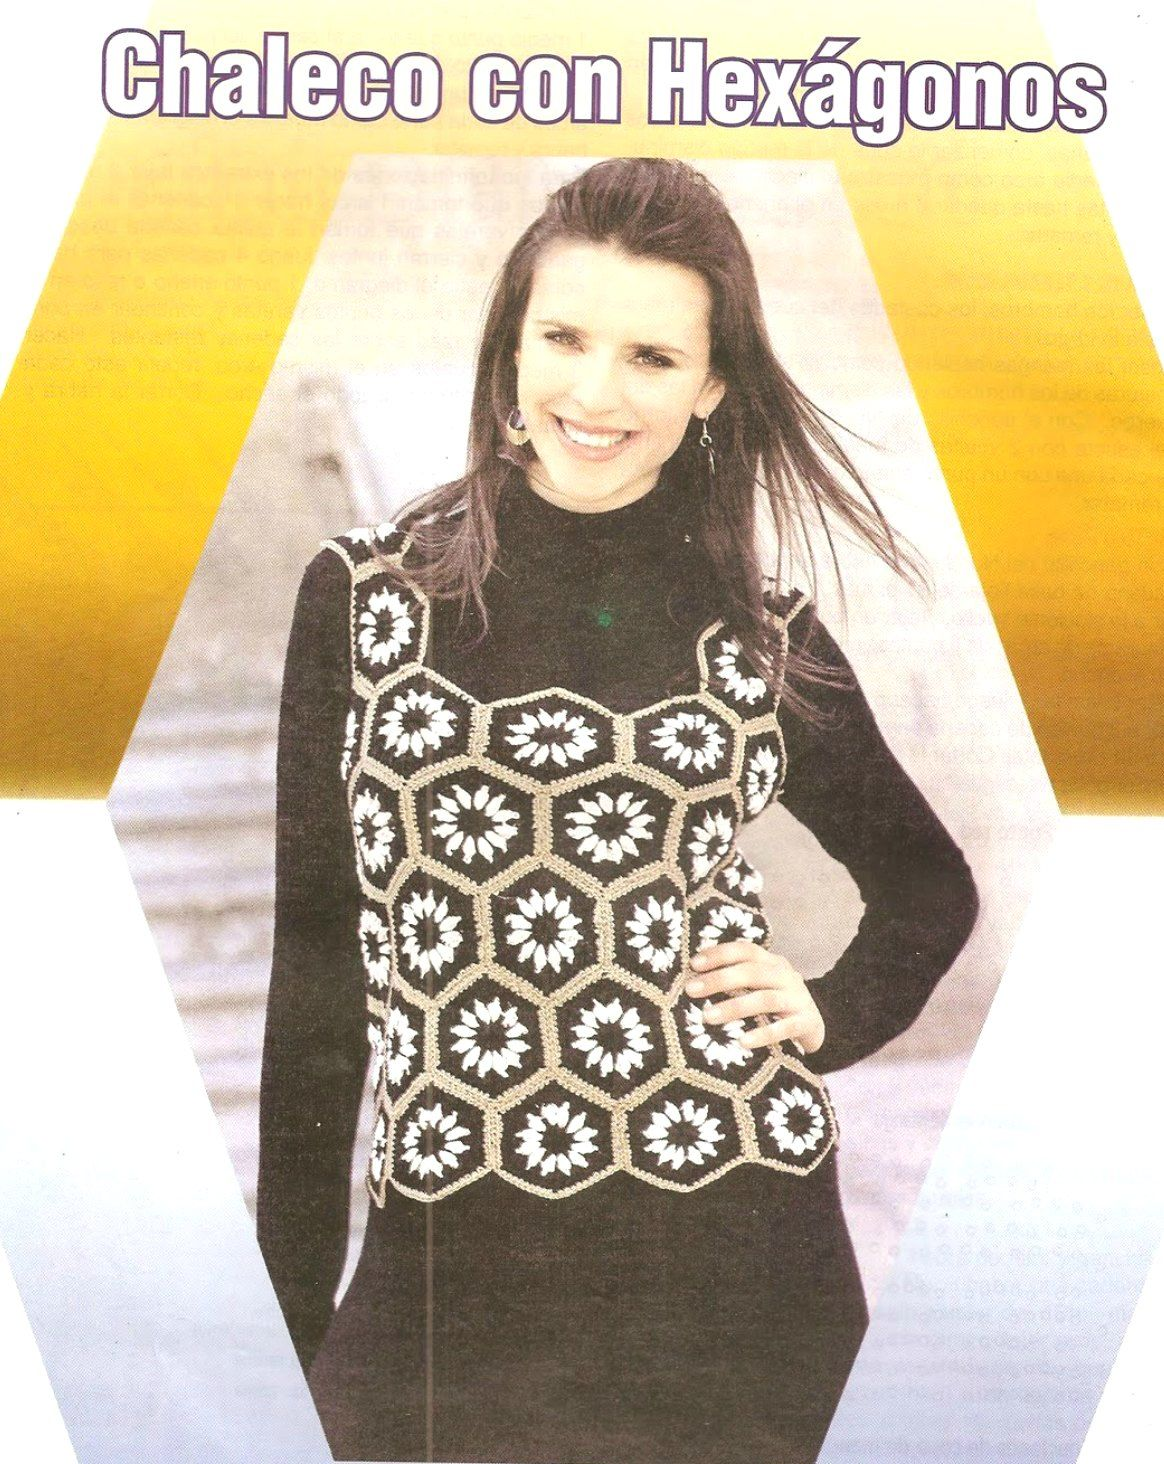 Chaleco top con hexagonos crochet tutorial | blusas crochet ...